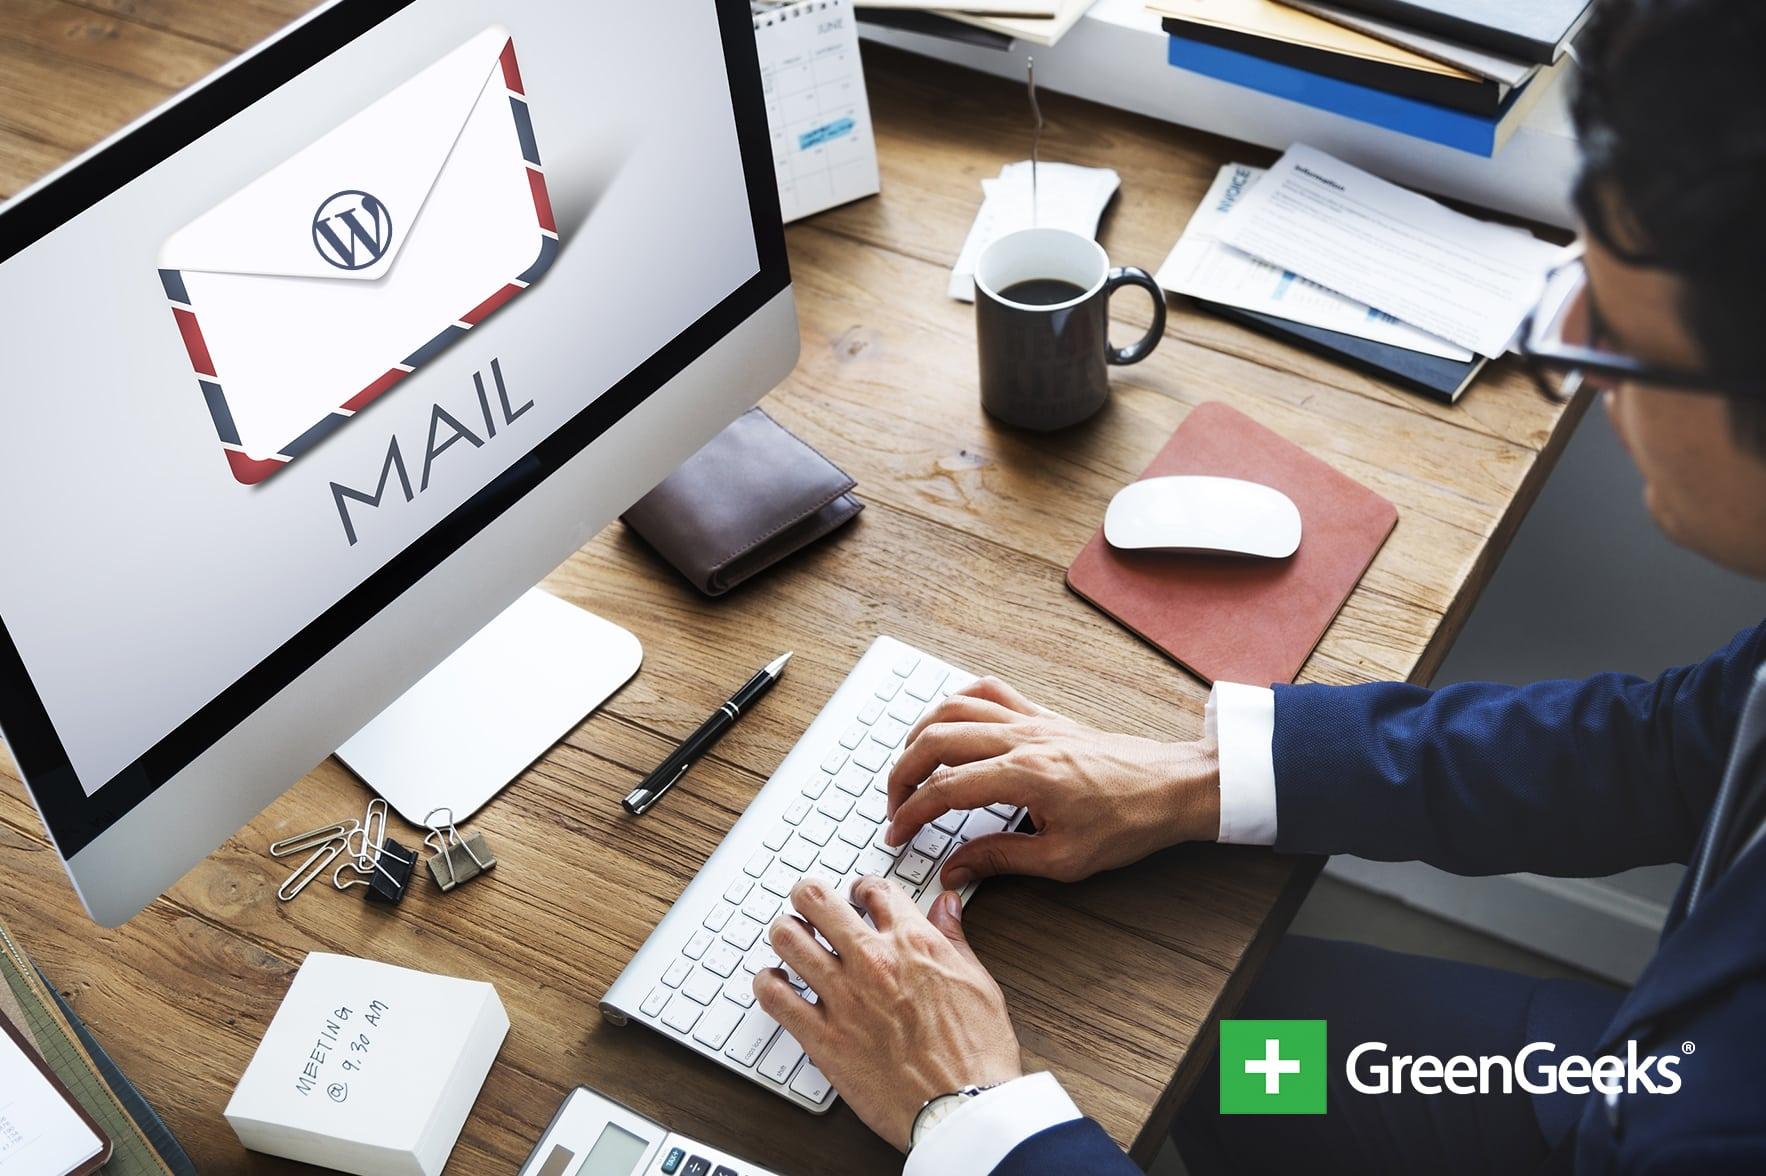 gmail smpt server